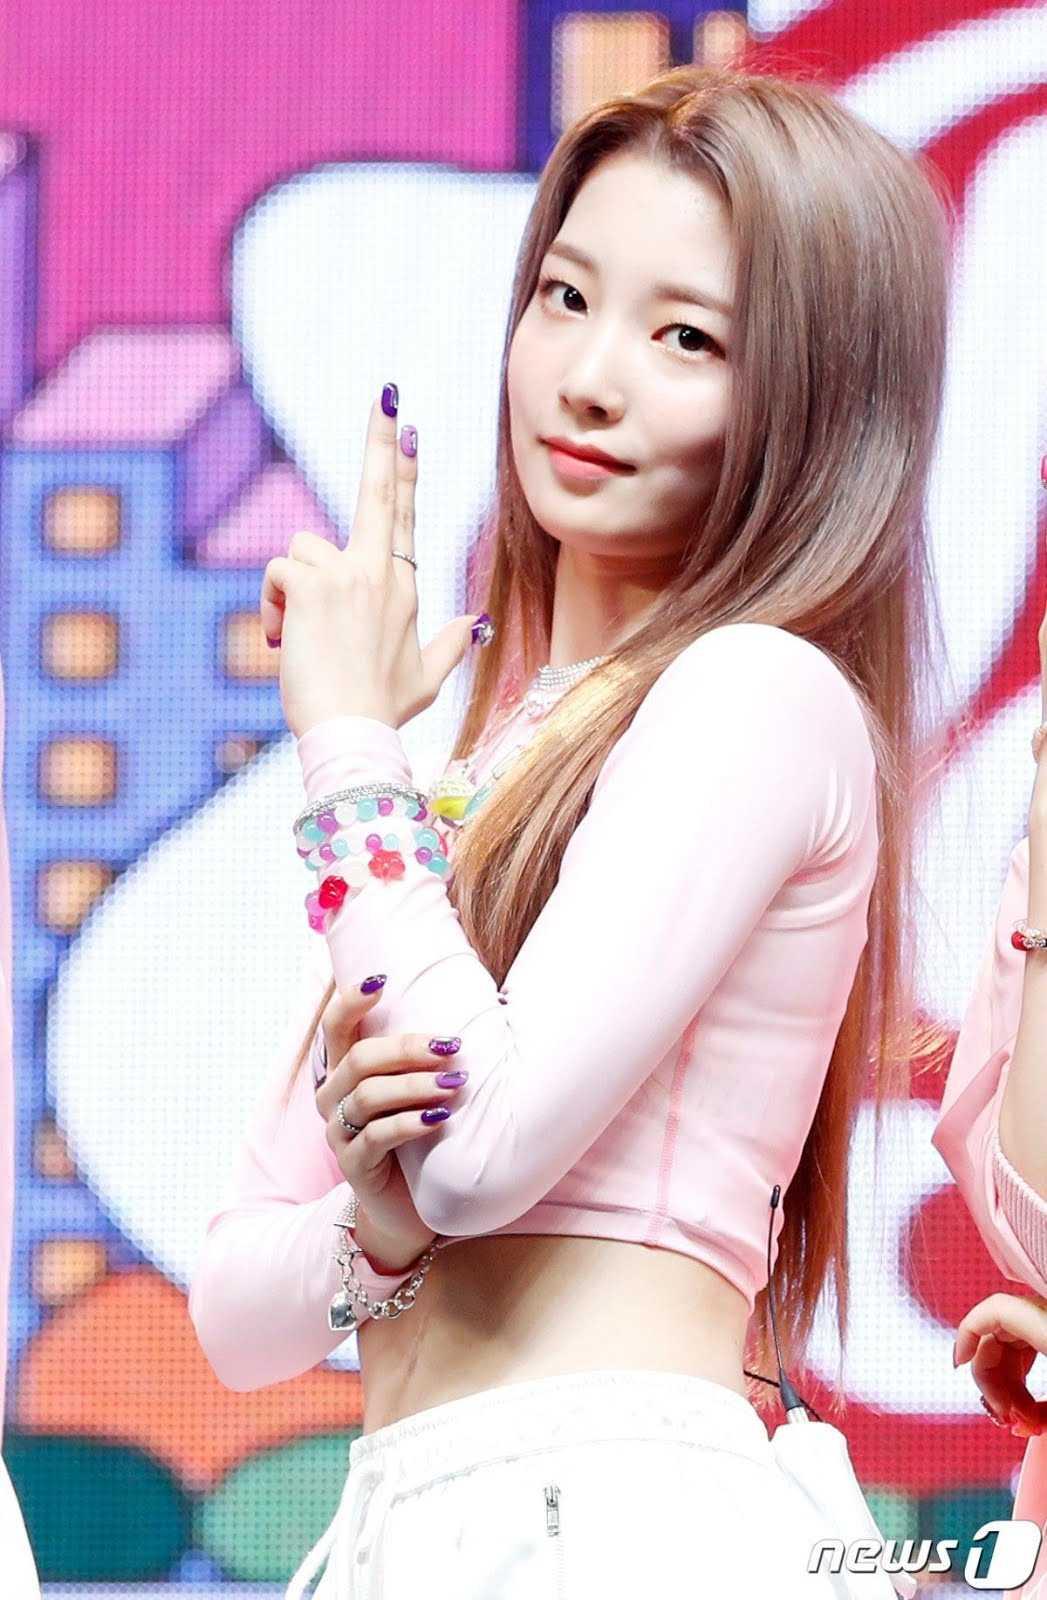 [THEQOO] JYP tarzı olan Rocket Punch üyesi